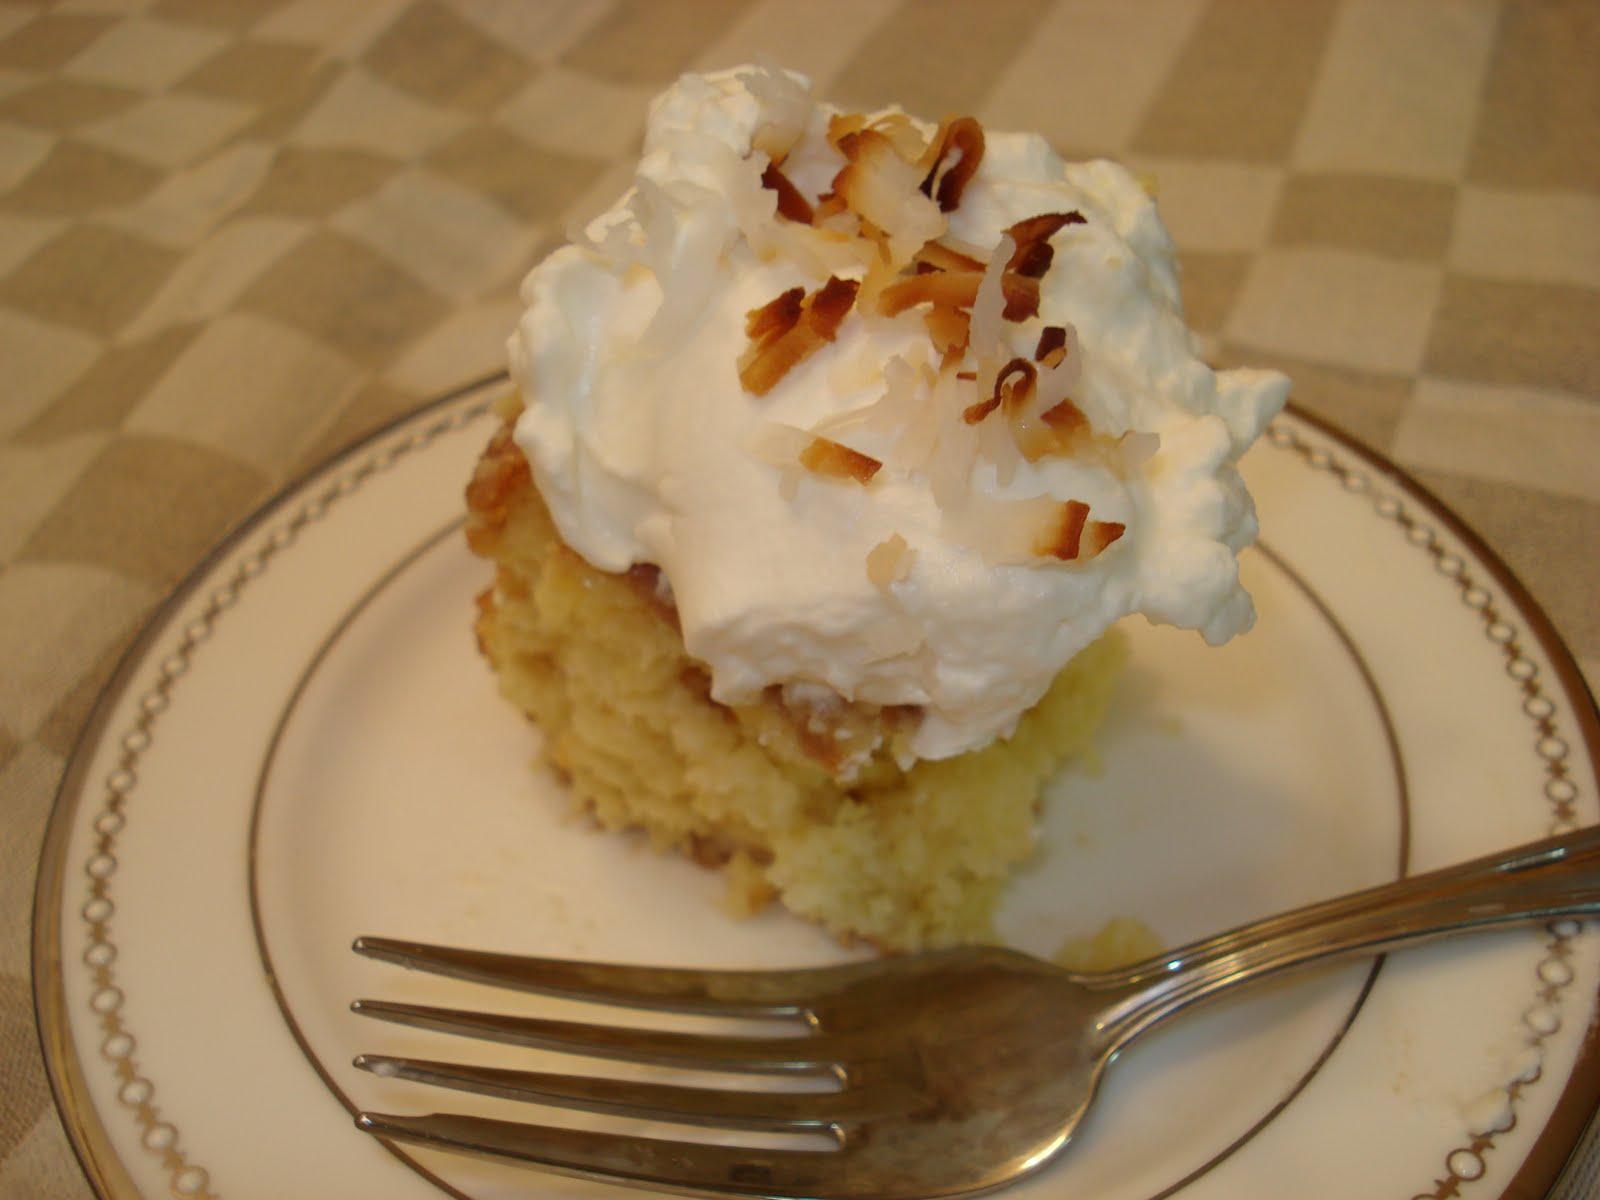 Rozlynn Bakes: Coconut Tres Leches Cake